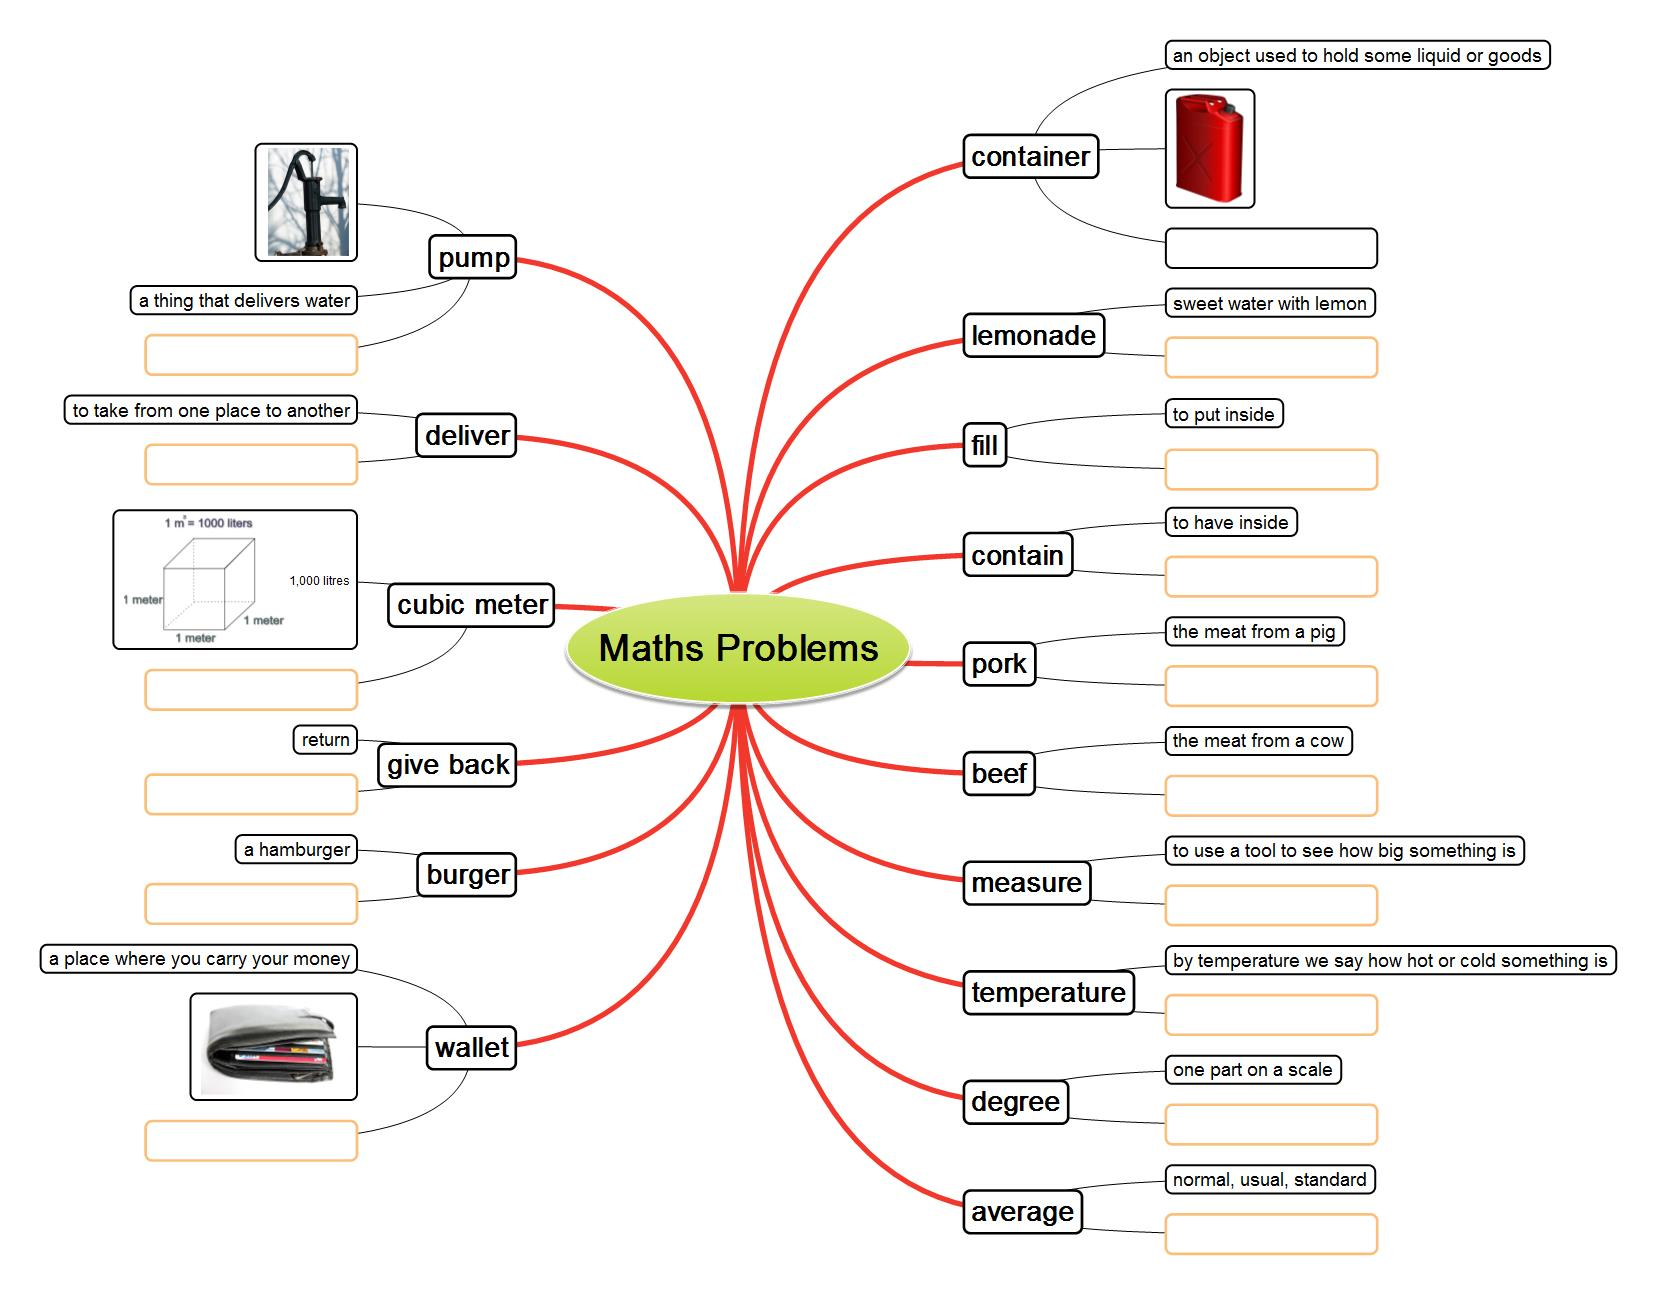 Mathematics problems mind map